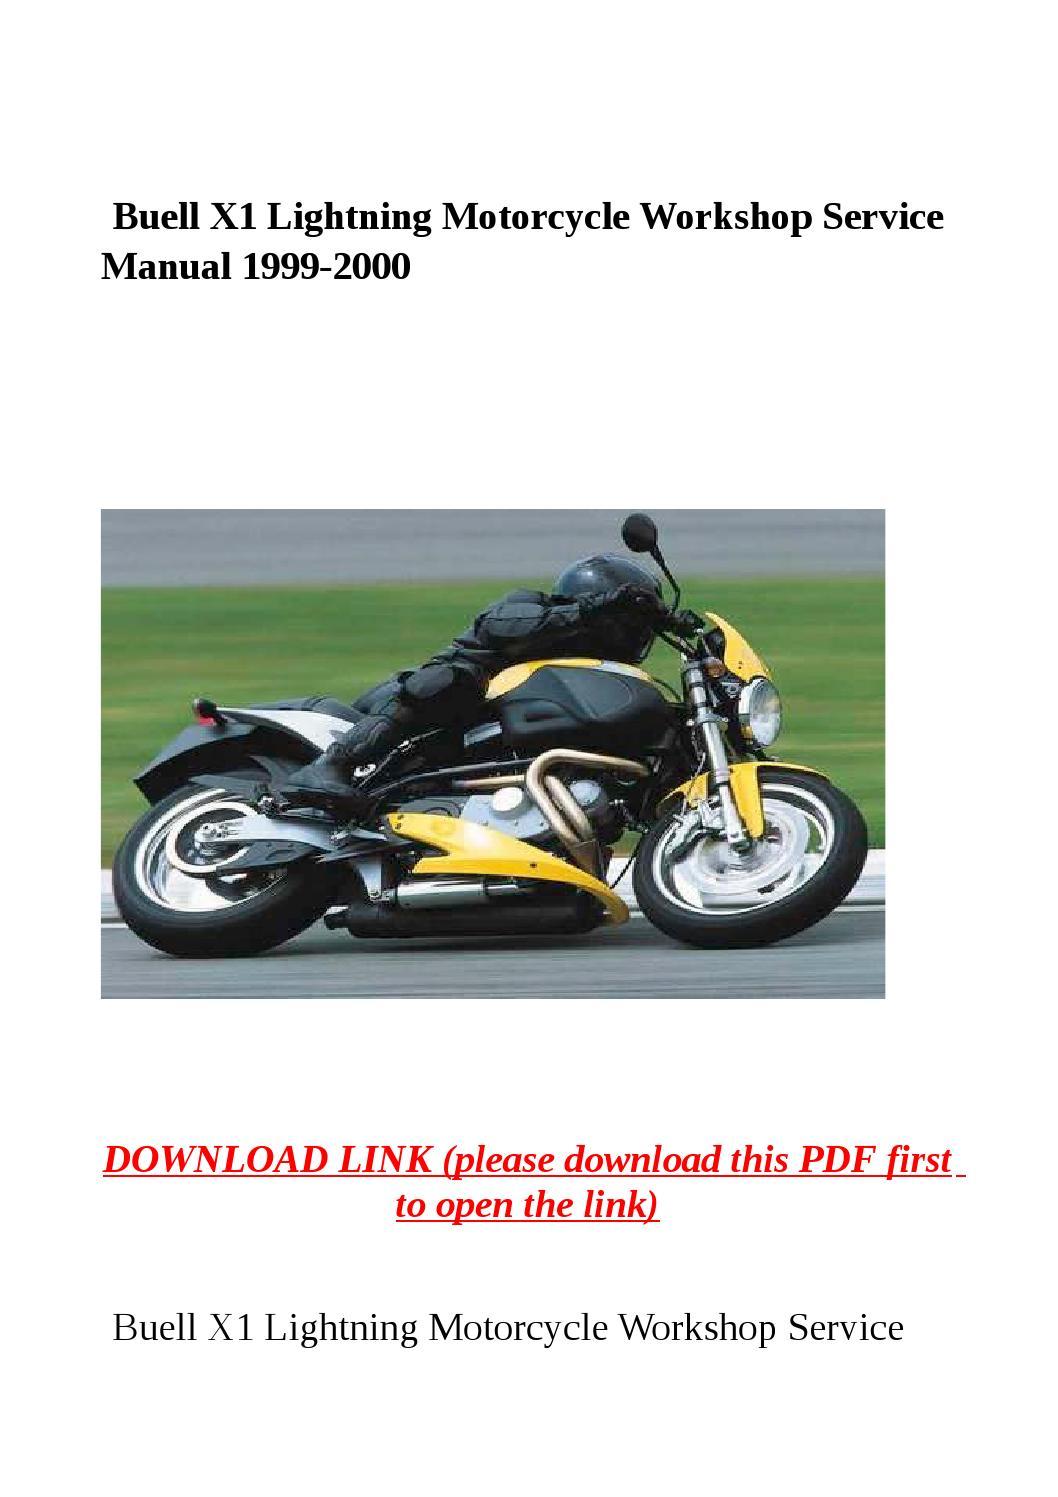 Buell X1 Lightning Motorcycle Workshop Service Manual 1999 border=